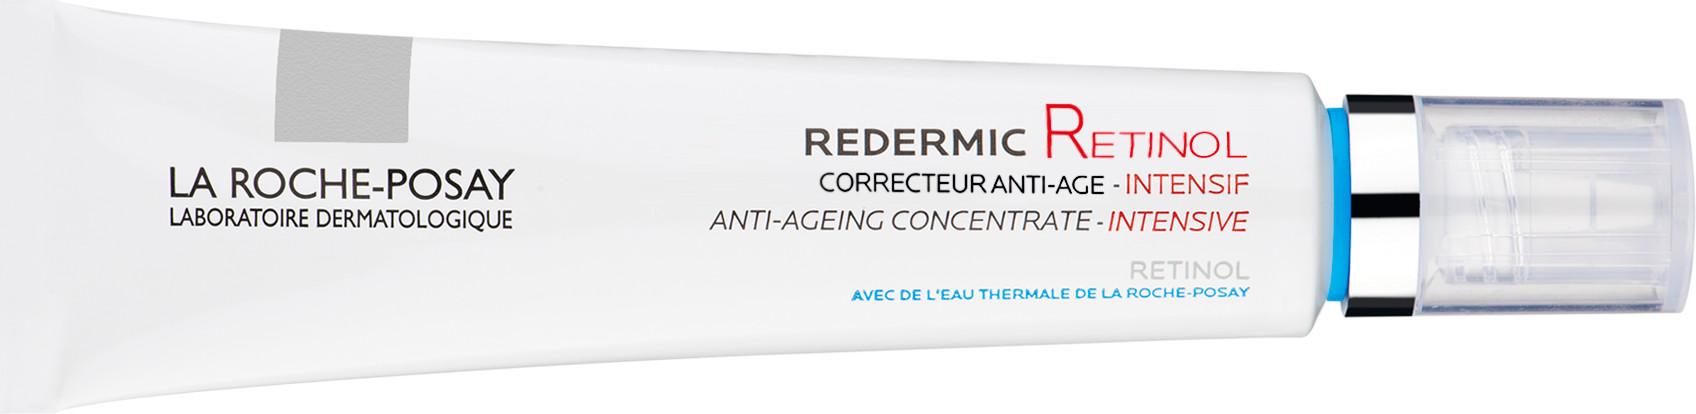 La Roche-Posay Redermic Anti-Aging Concentrate Intense